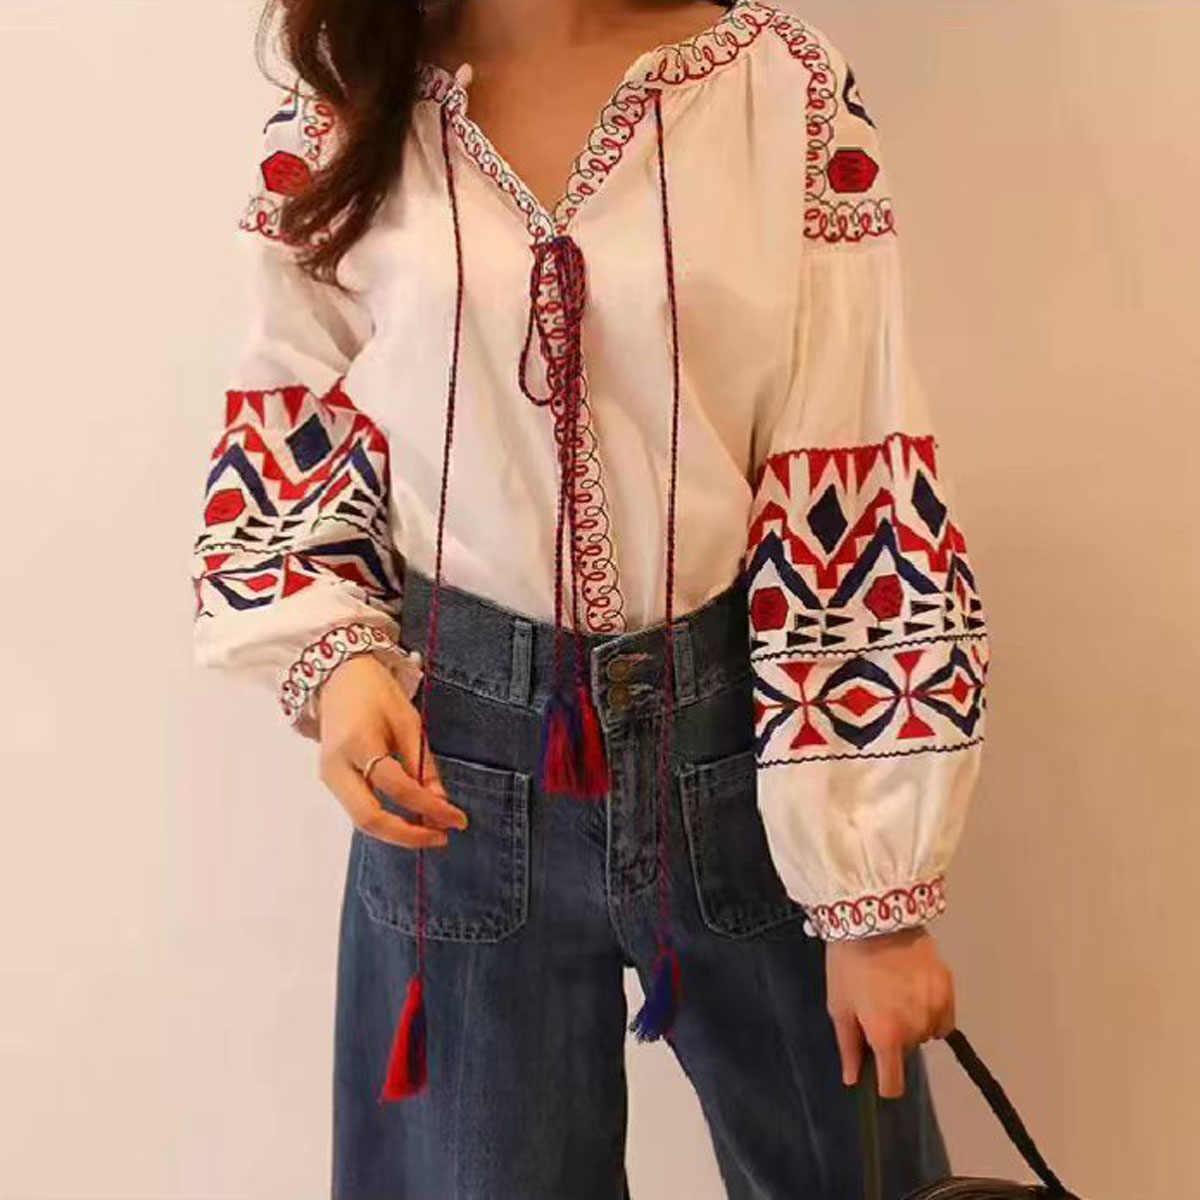 87fc542e6c2e Jastie rojo blusa bordada camisa manga larga linterna cuello en V ...